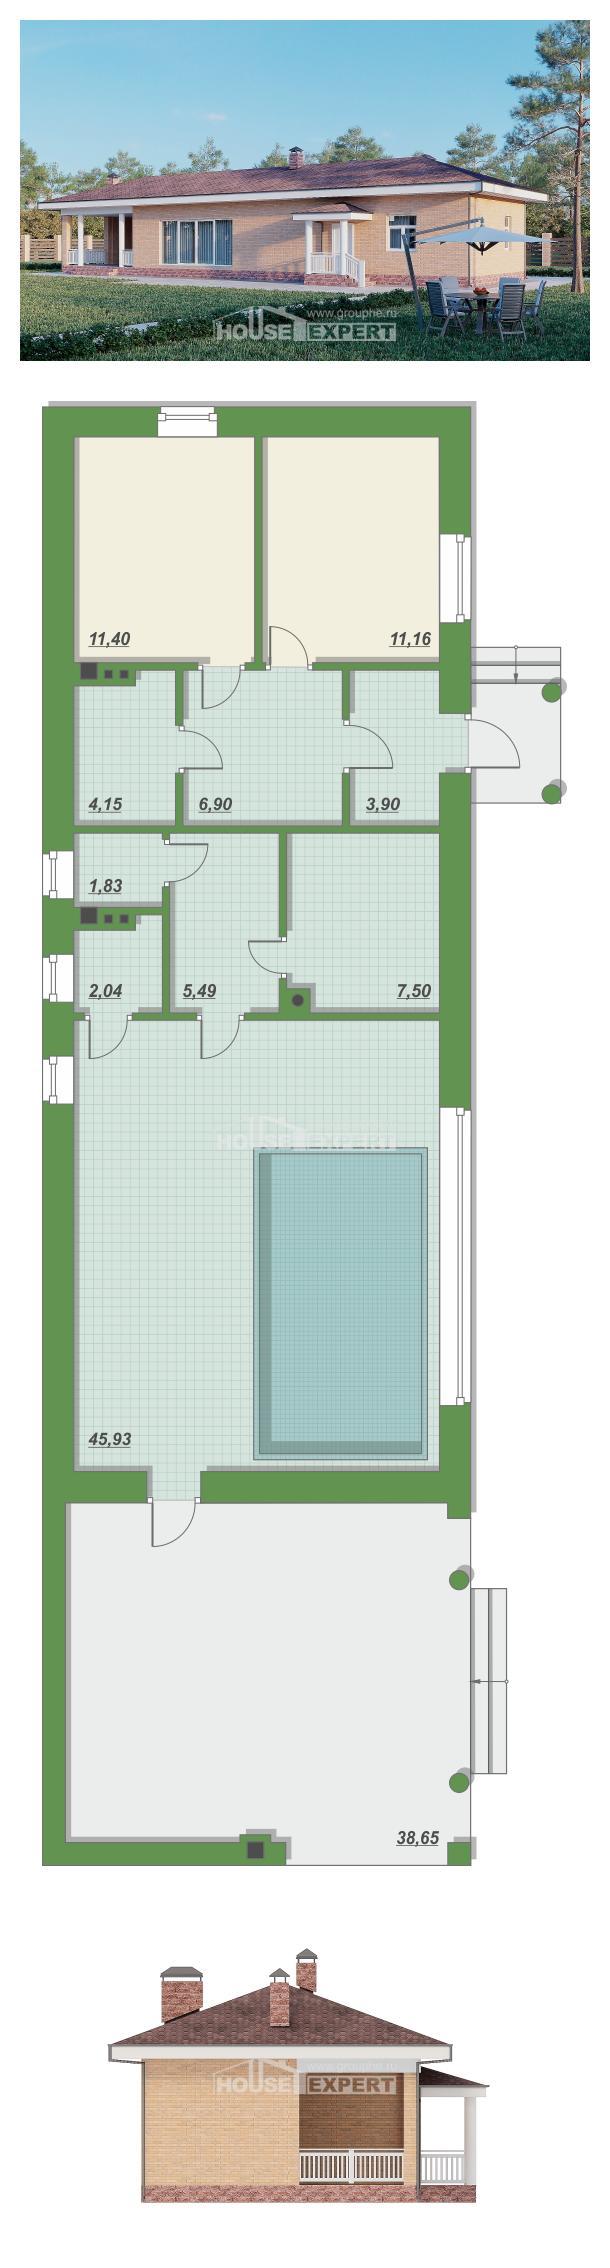 Проект дома 110-006-Л | House Expert